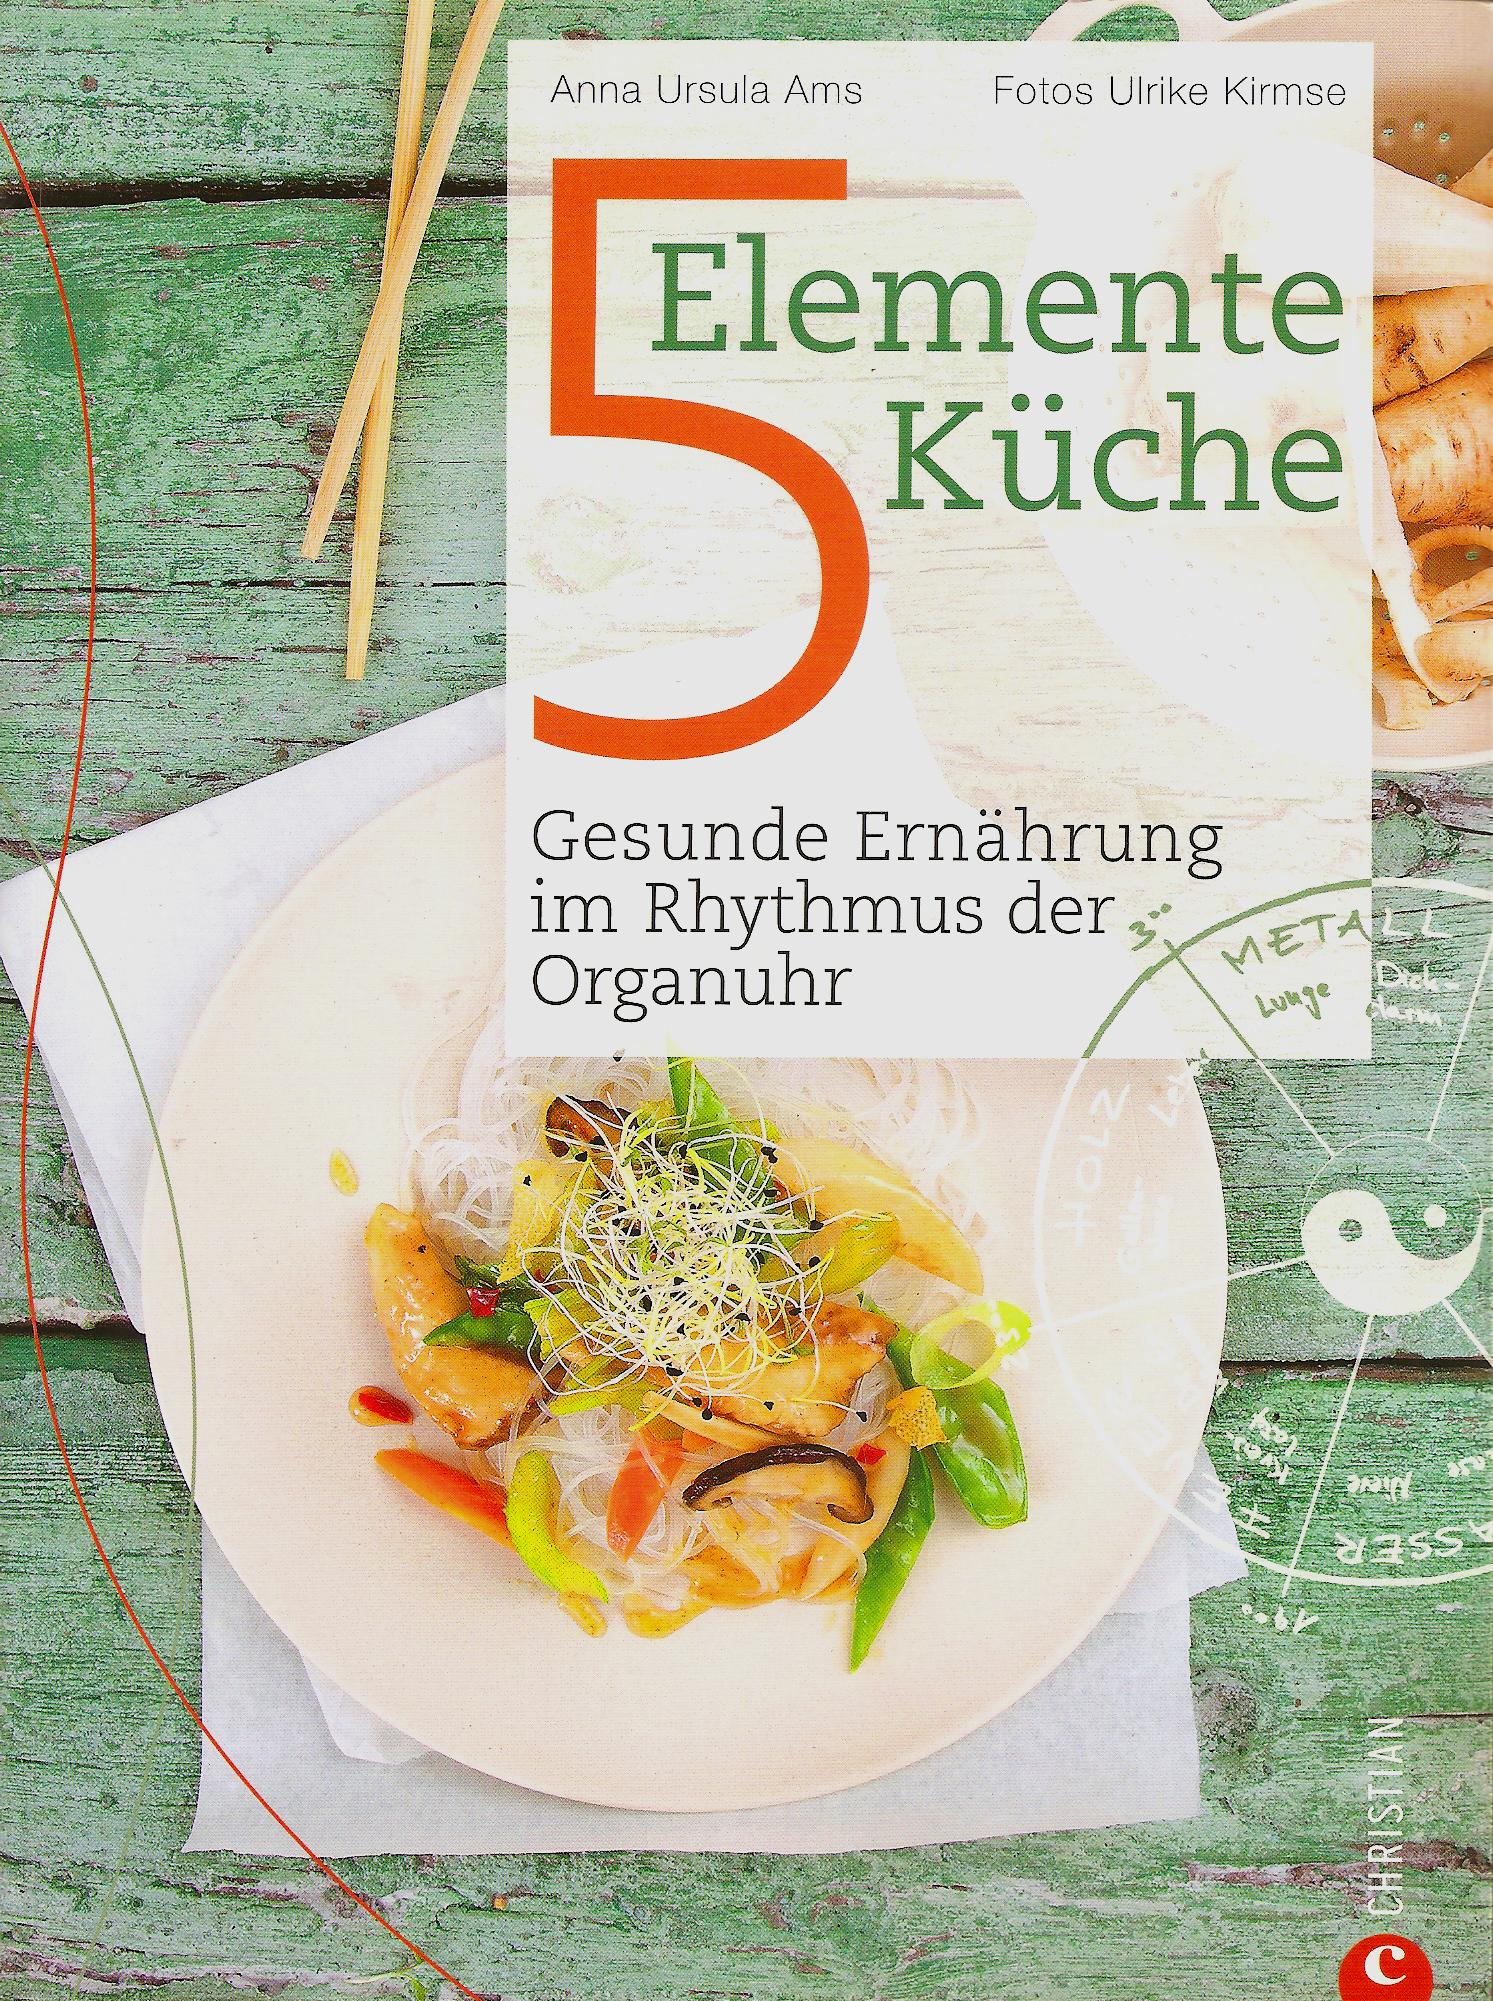 Urs Hug | Foodstyling. 5-Elemente-Küche - Gesunde Ernährung im Rhythmus der Organuhr. Christian Verlag. ISBN-13: 978-3-86244-948-4